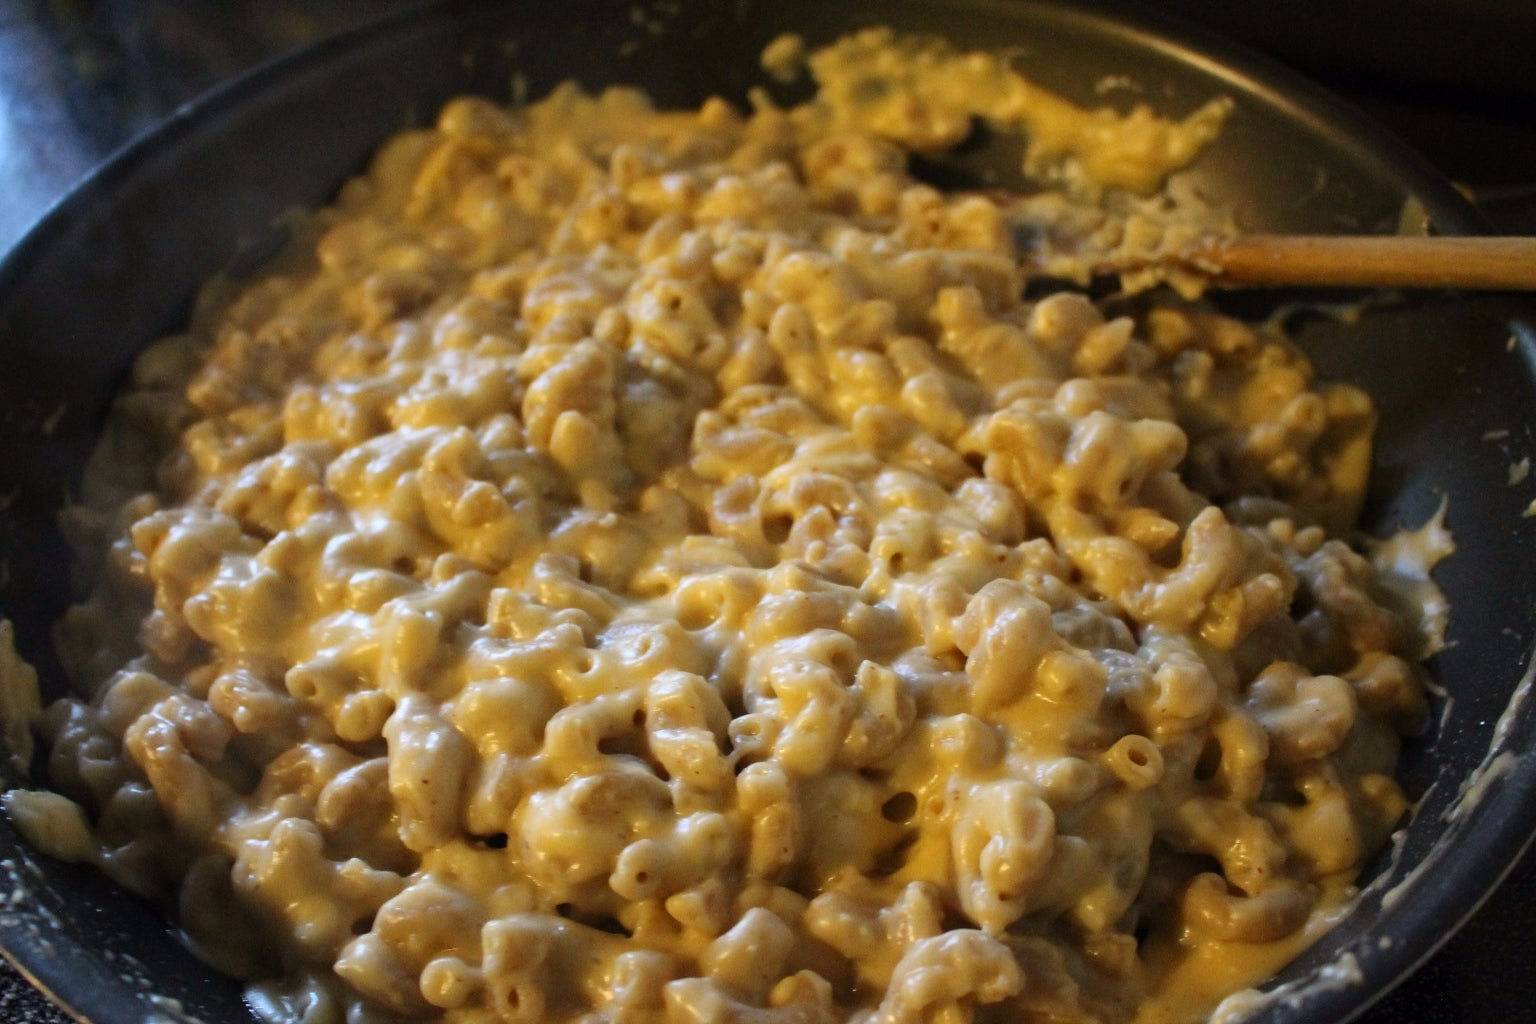 Cook Pasta & Make Cheese Sauce